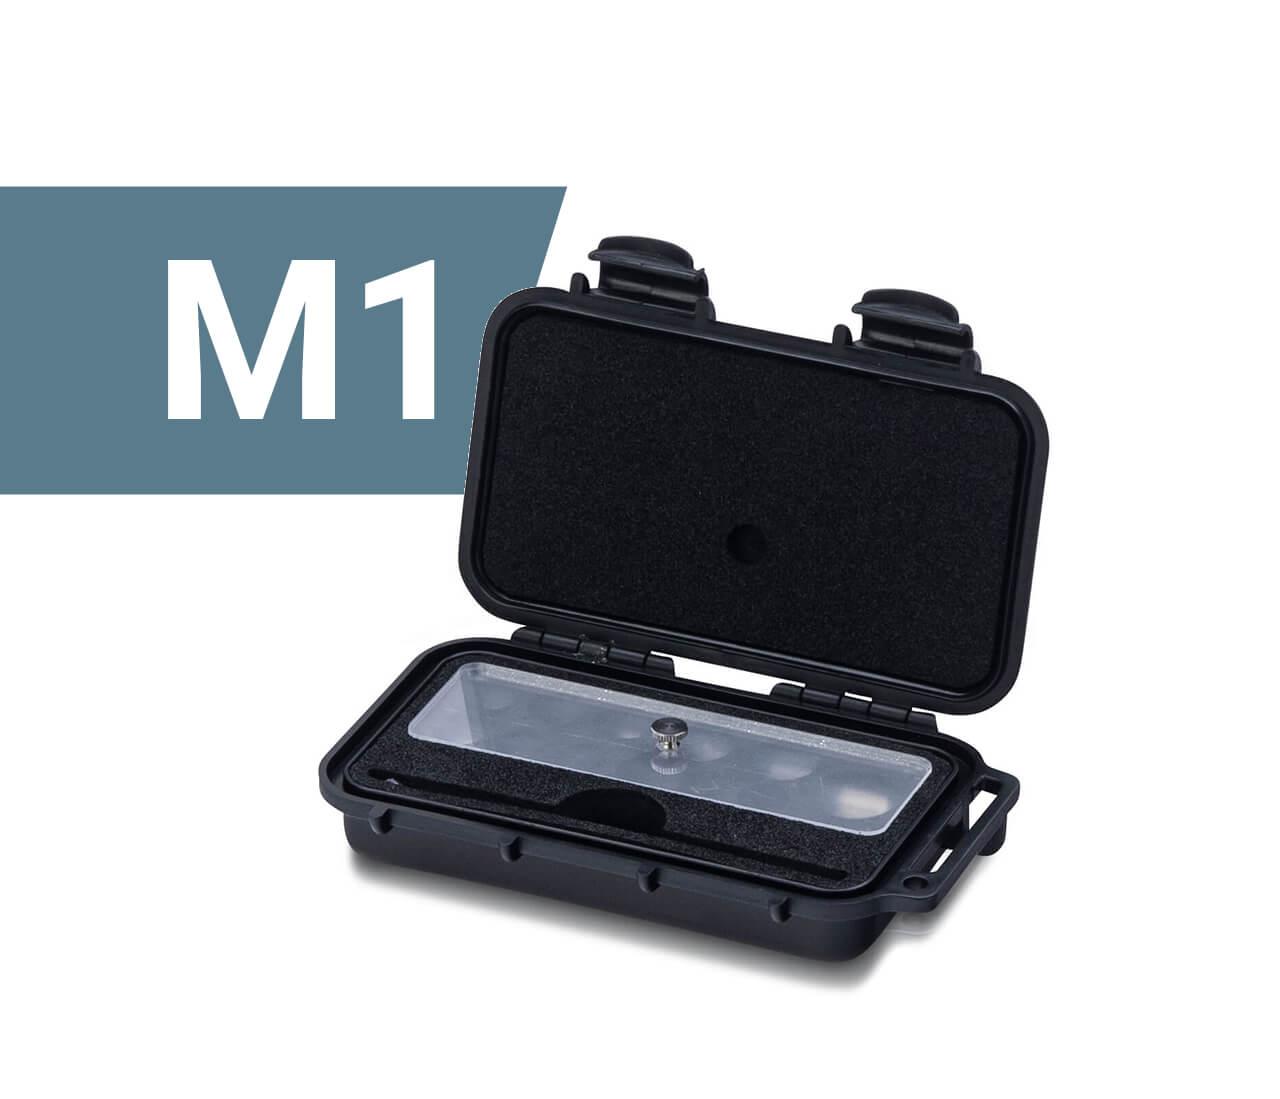 M1 weight set